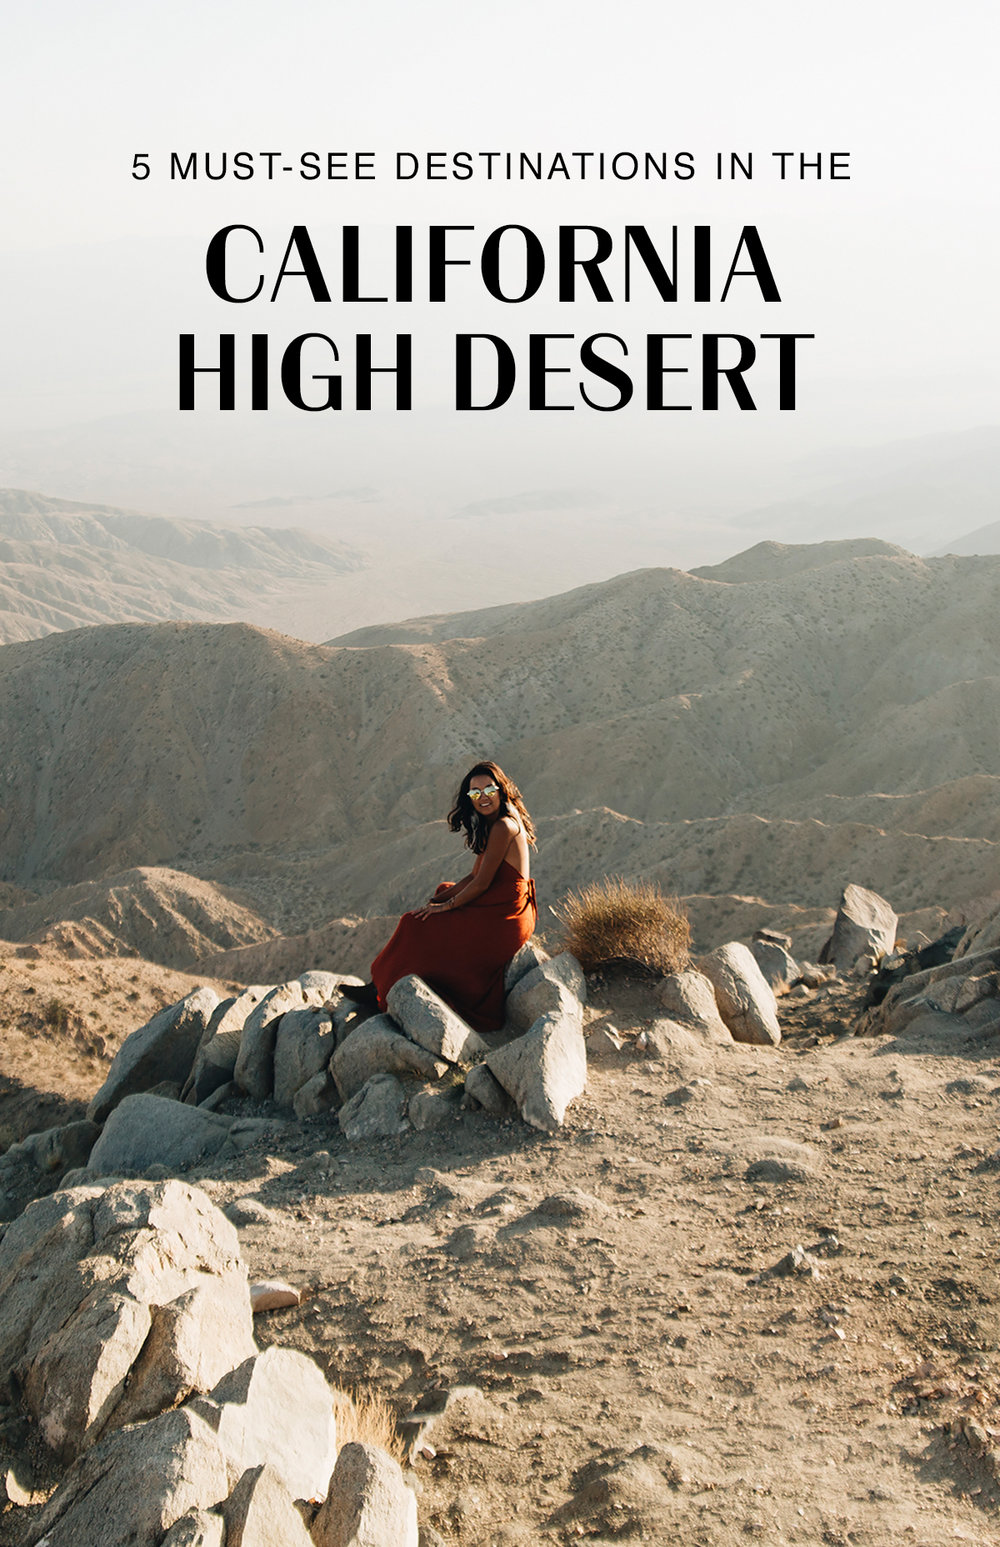 social-chrissihernandez-joshuaTree-highdesert-destinations.jpg